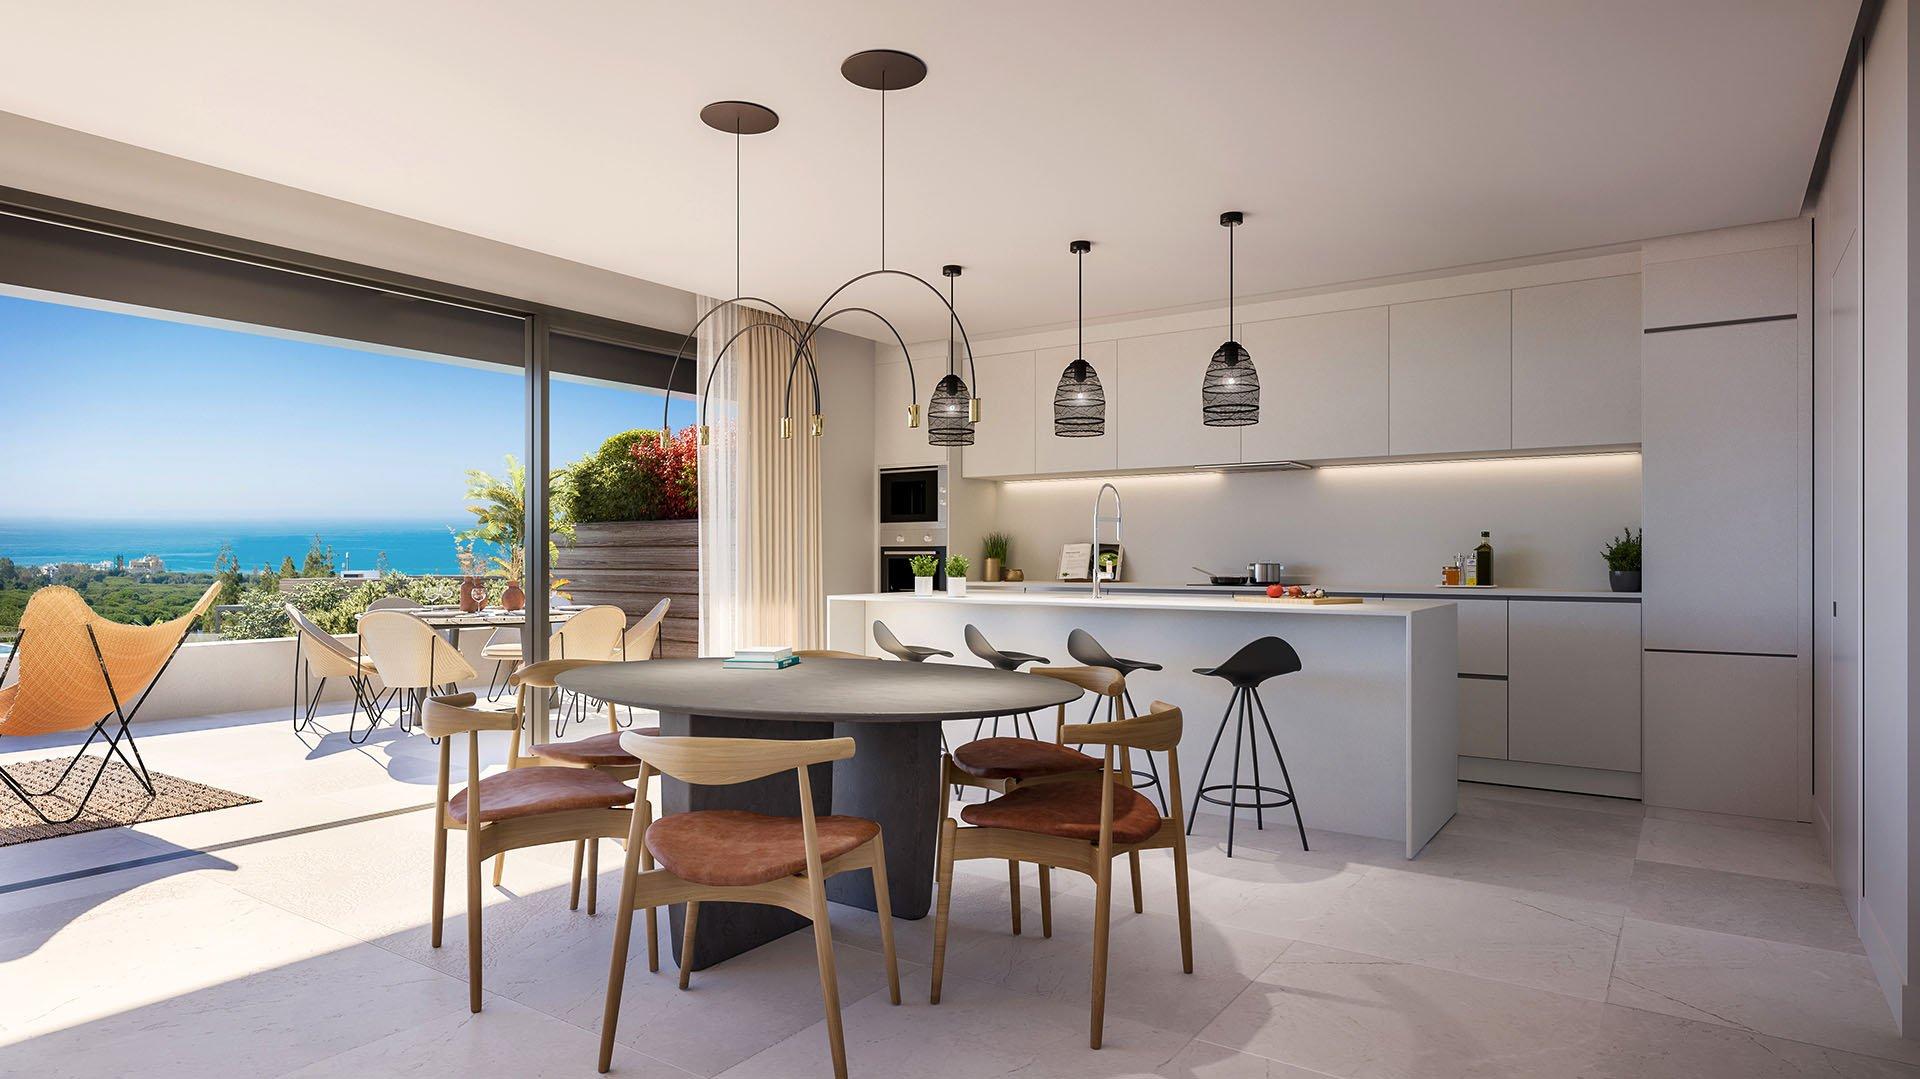 Artola Homes II: Gorgeous frontline golf apartments in Cabopino, Marbella